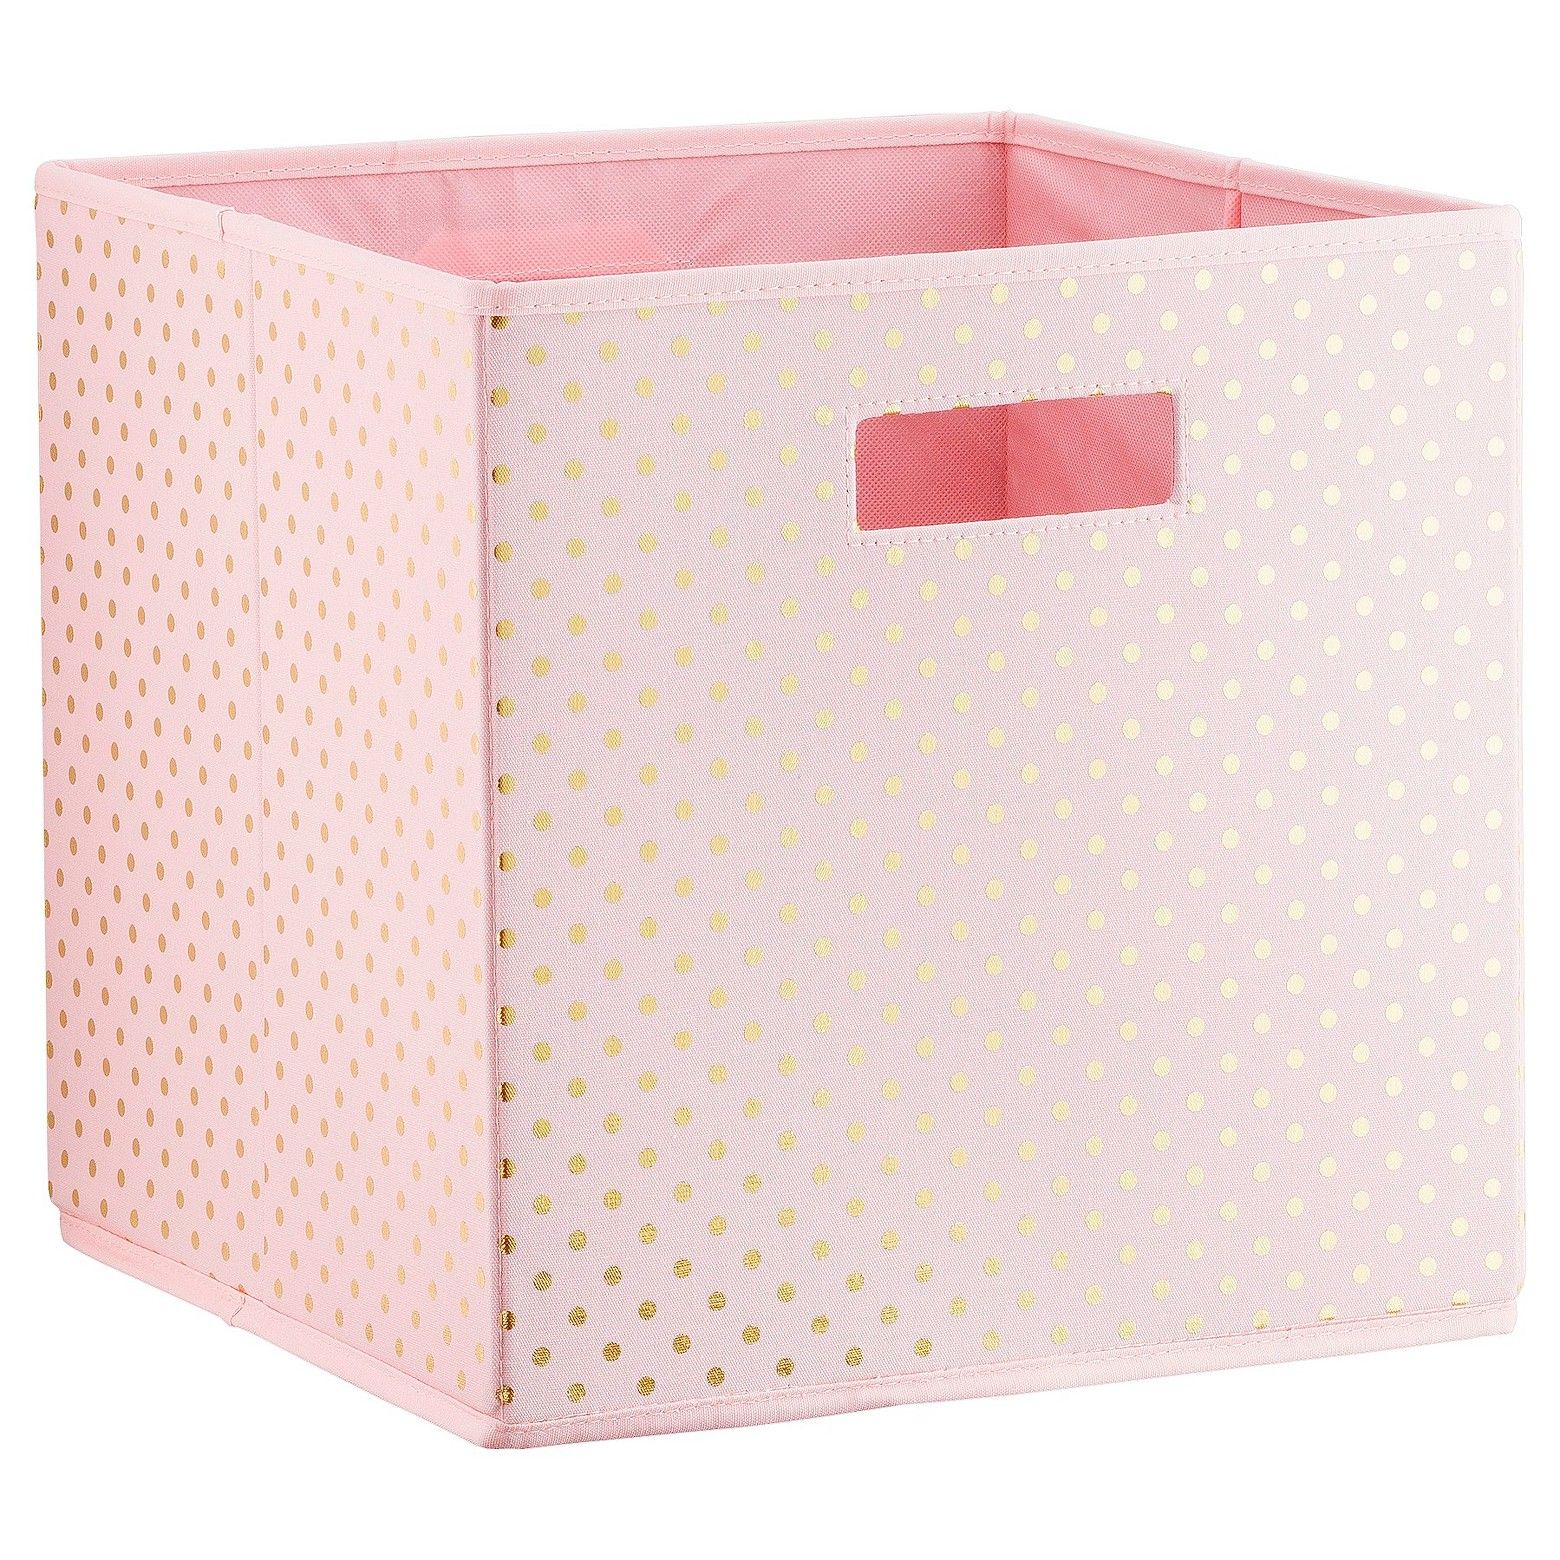 Polka Dots Kd Toy Storage Bin Pink Pillowfort In 2020 Cube